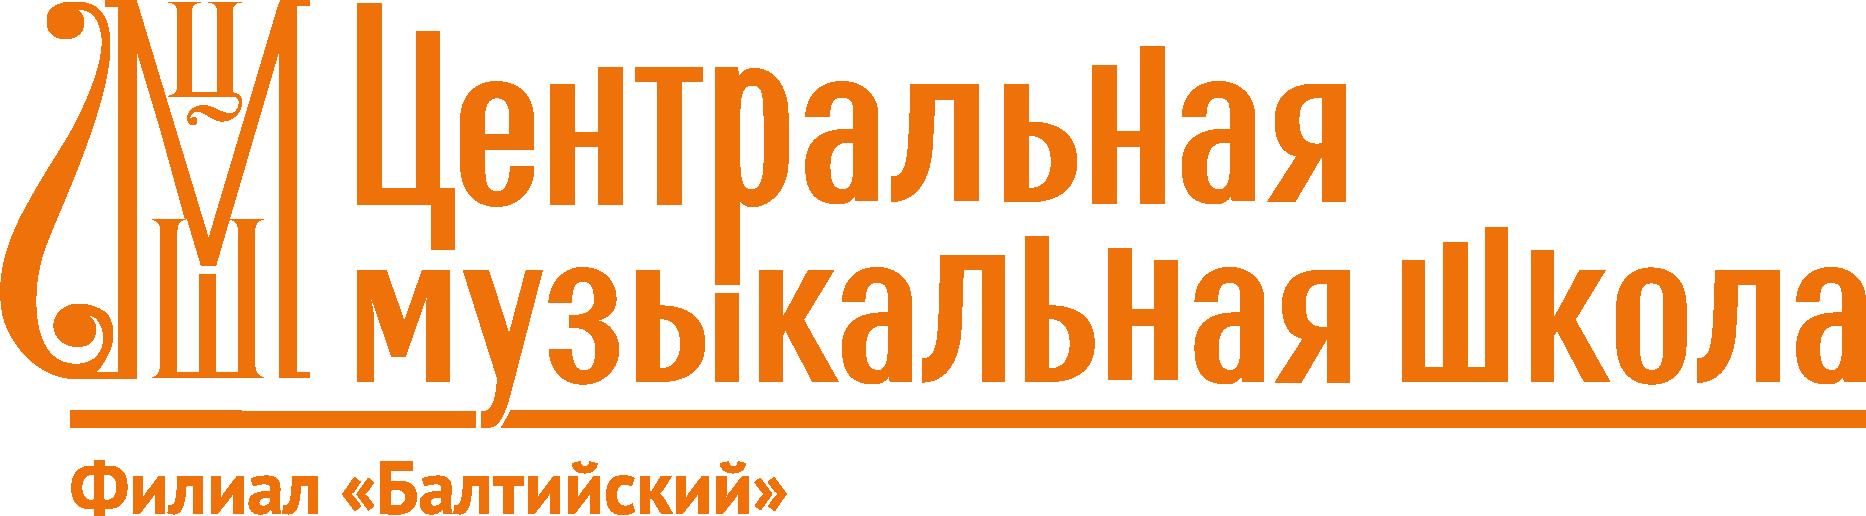 "Филиал ЦМШ ""Балтийский"""